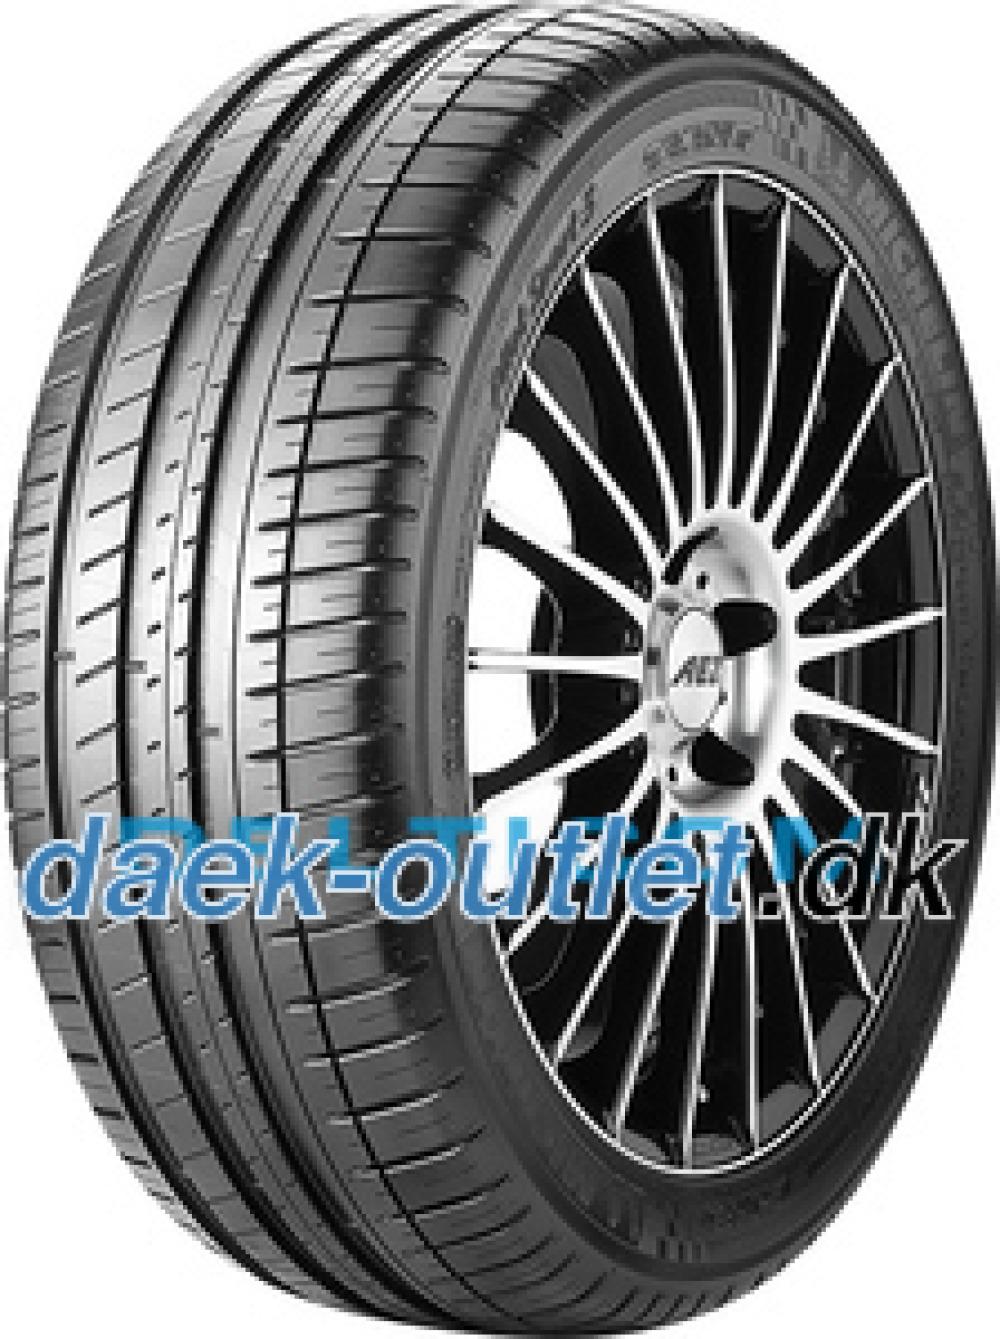 Michelin Pilot Sport 3 ZP ( 245/35 R20 95Y XL *MOE, Acoustic, med fælgbeskyttelses liste (FSL), runflat )